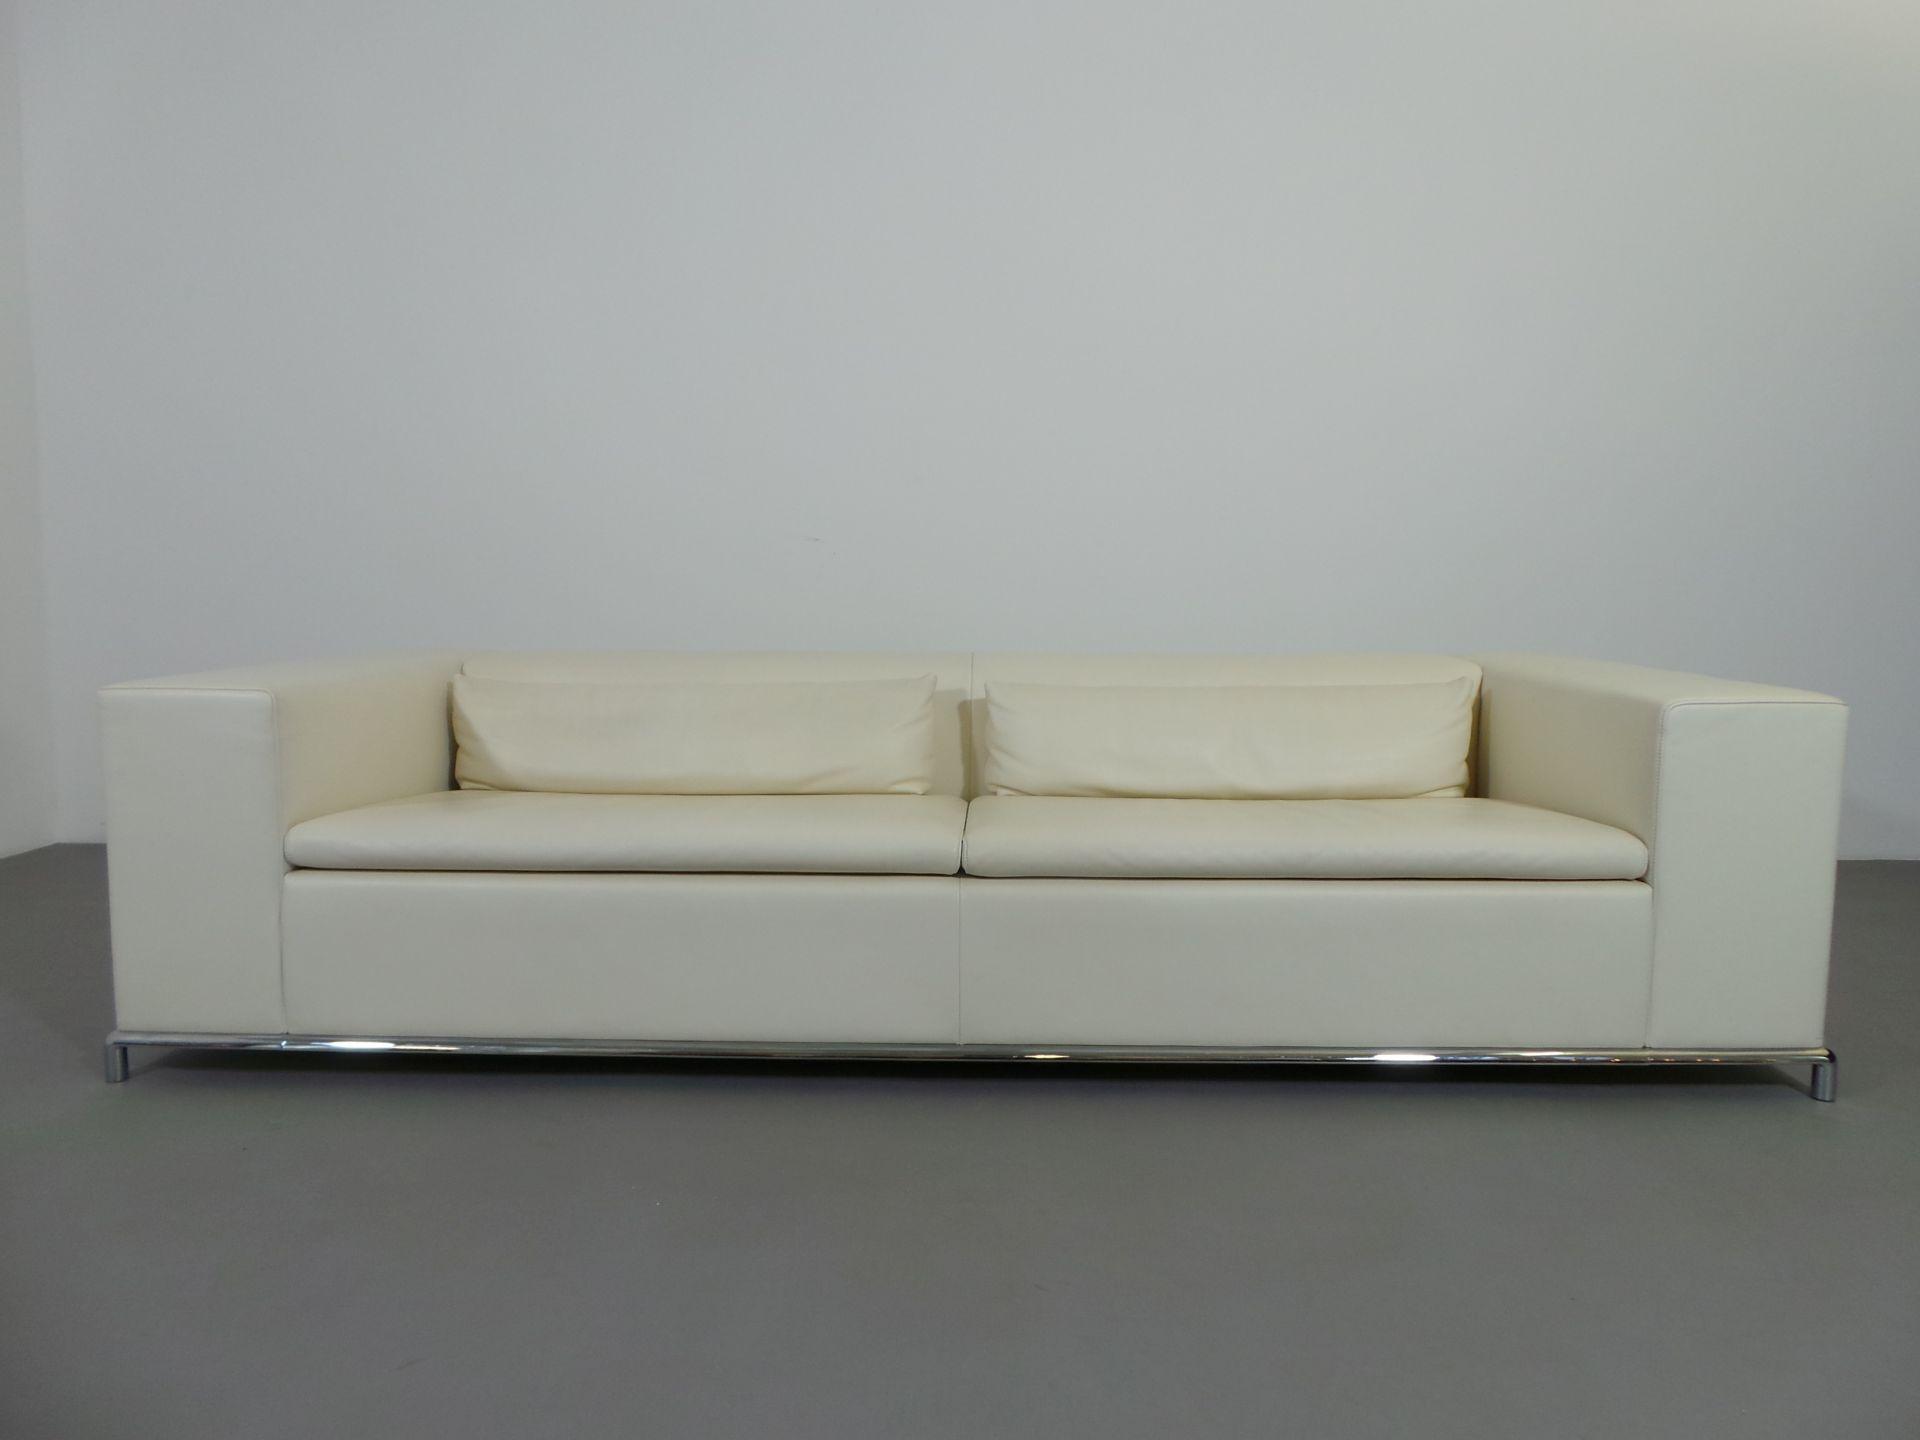 De Sede 3-Sitzer Sofa DS 7 Antonella Scarpitta Leder